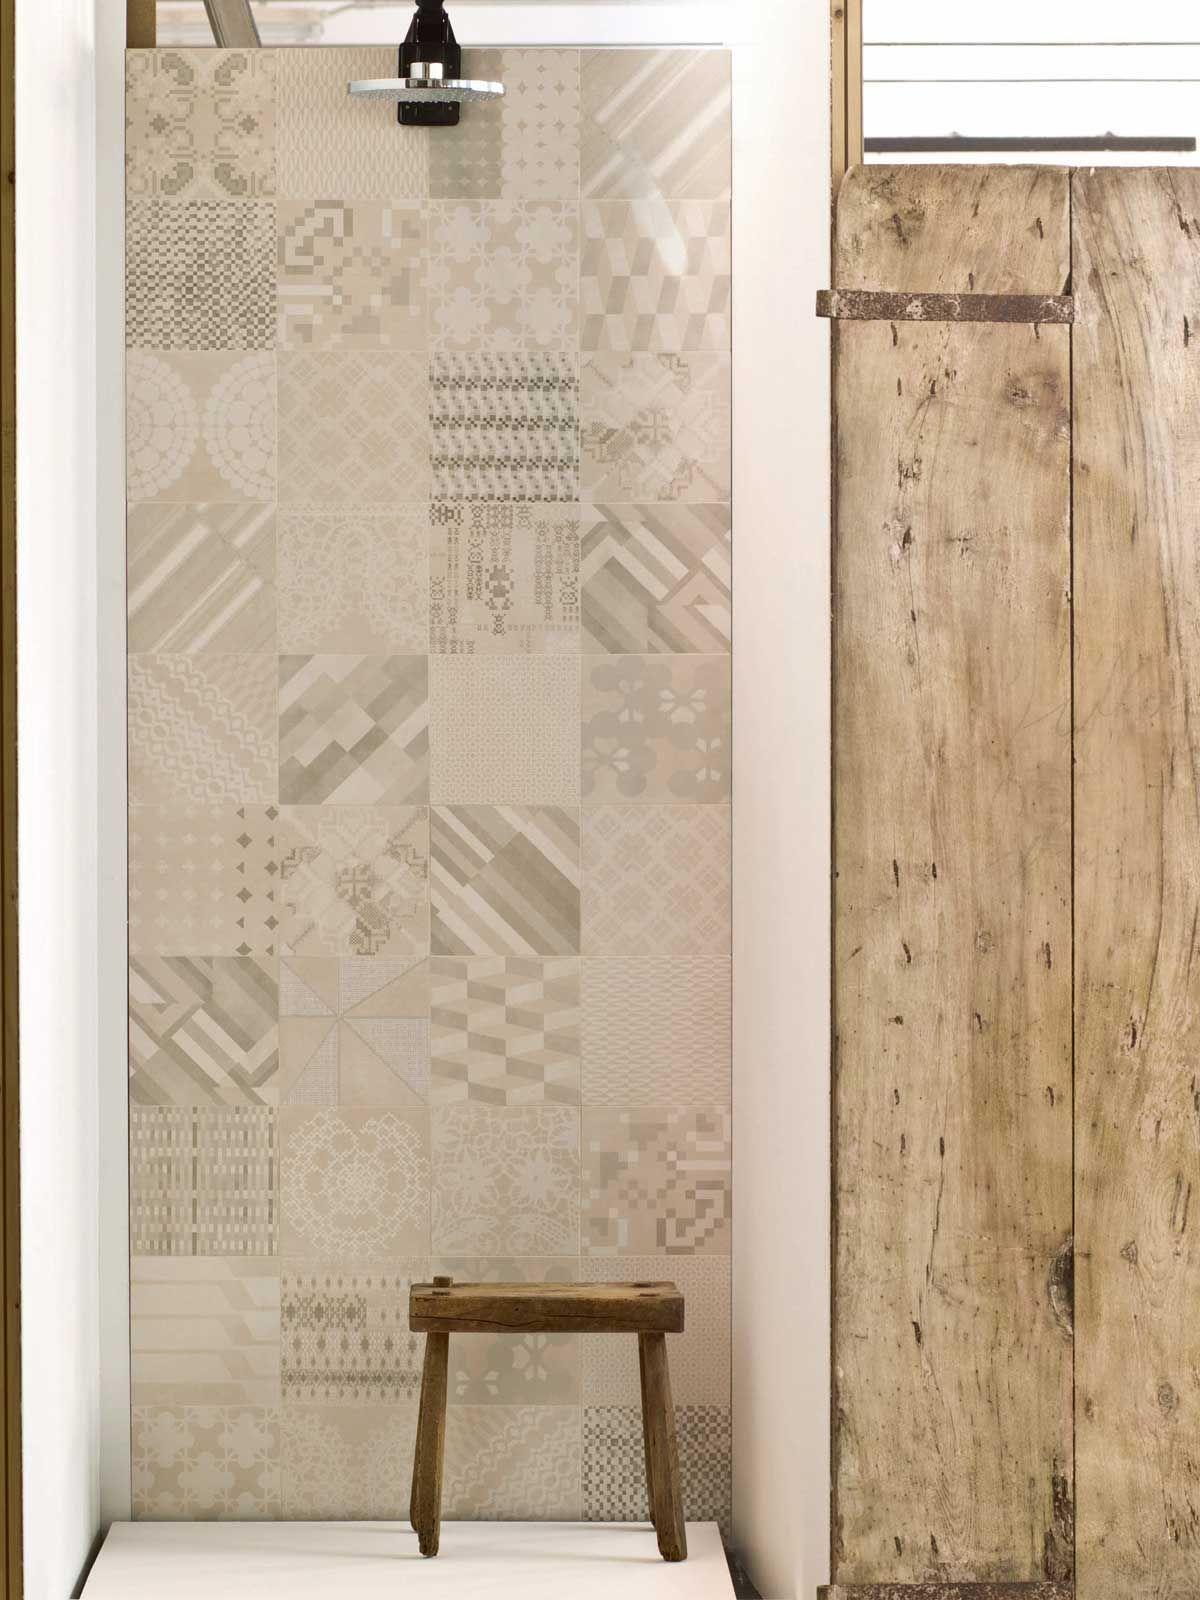 Küchenideen rustikal modern nora klemm noraklemm on pinterest